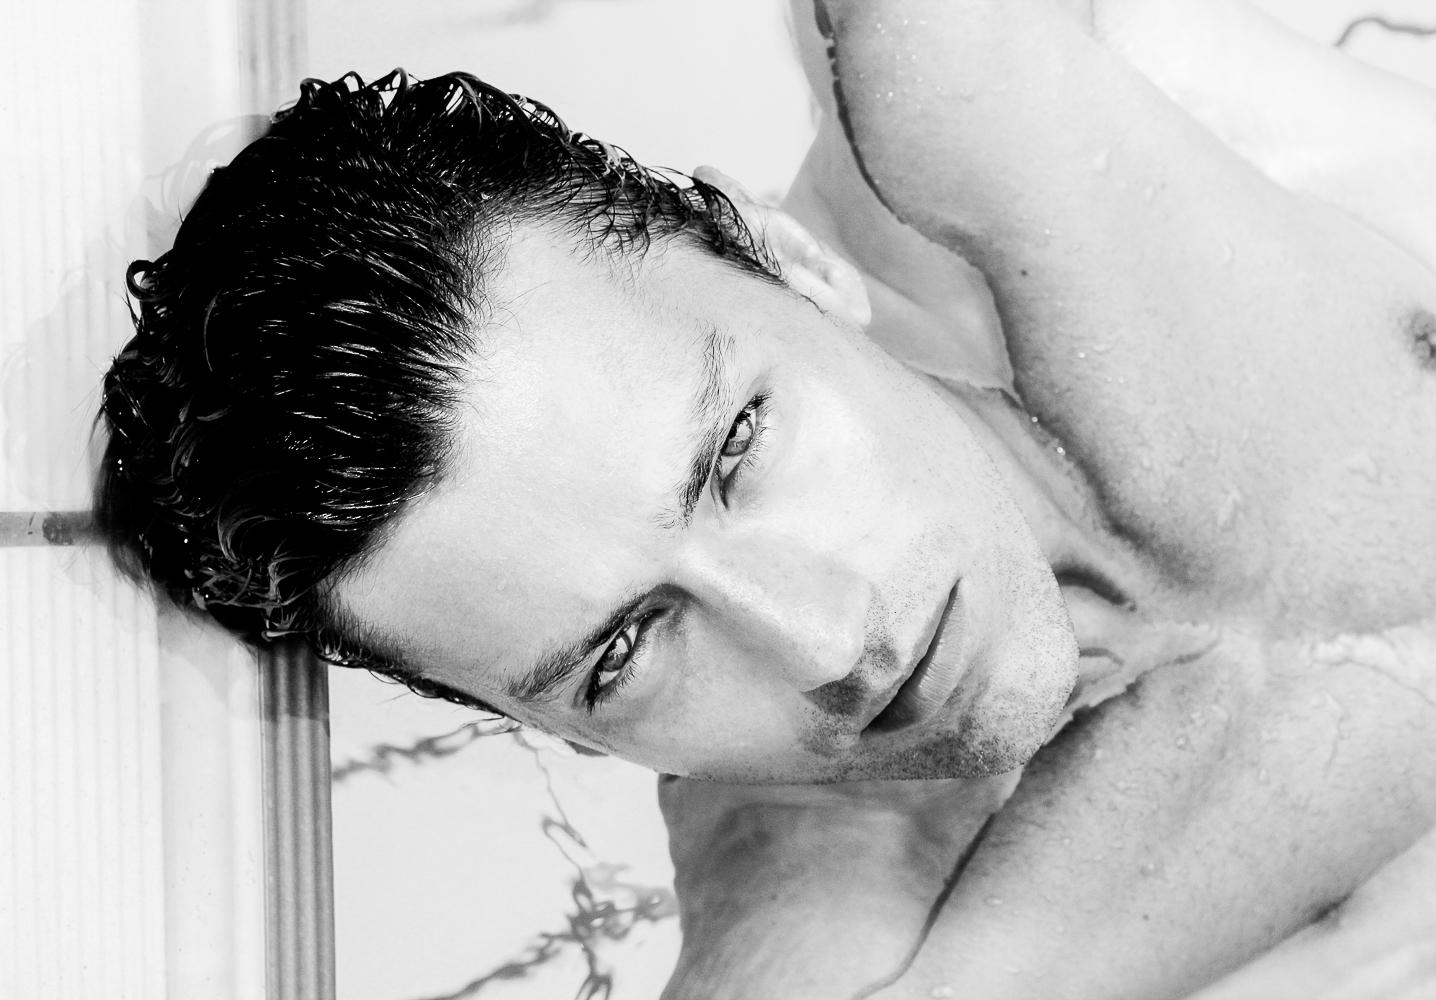 Adon Exclusive: Model  Mak Wenclav By Mohamed Irwan